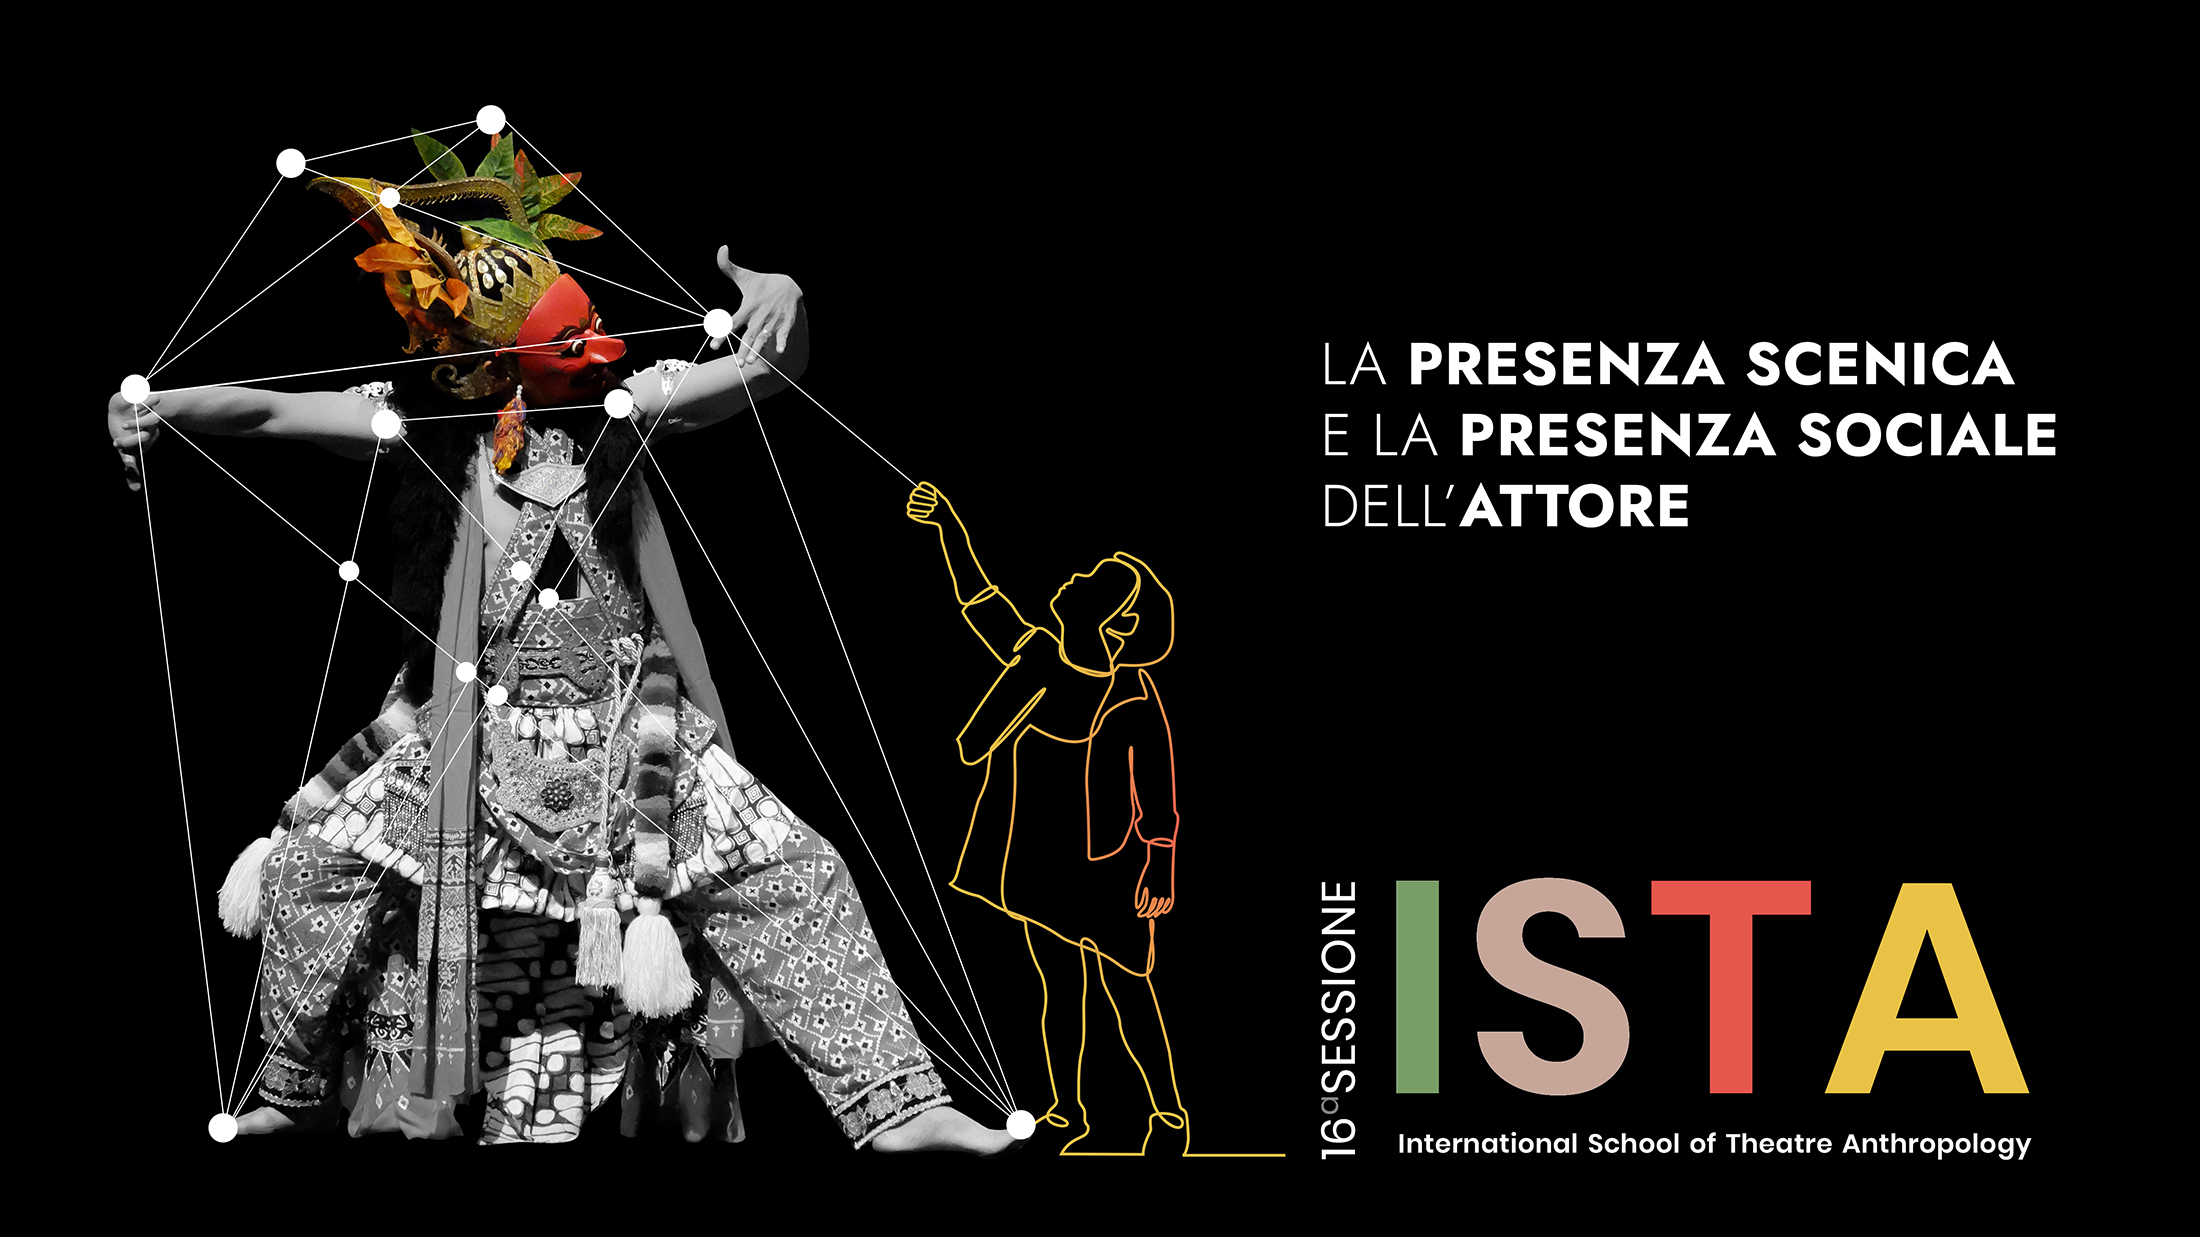 Calendario Accademico Sapienza 2020 2020.Xvi Sessione Ista International School Of Theatre